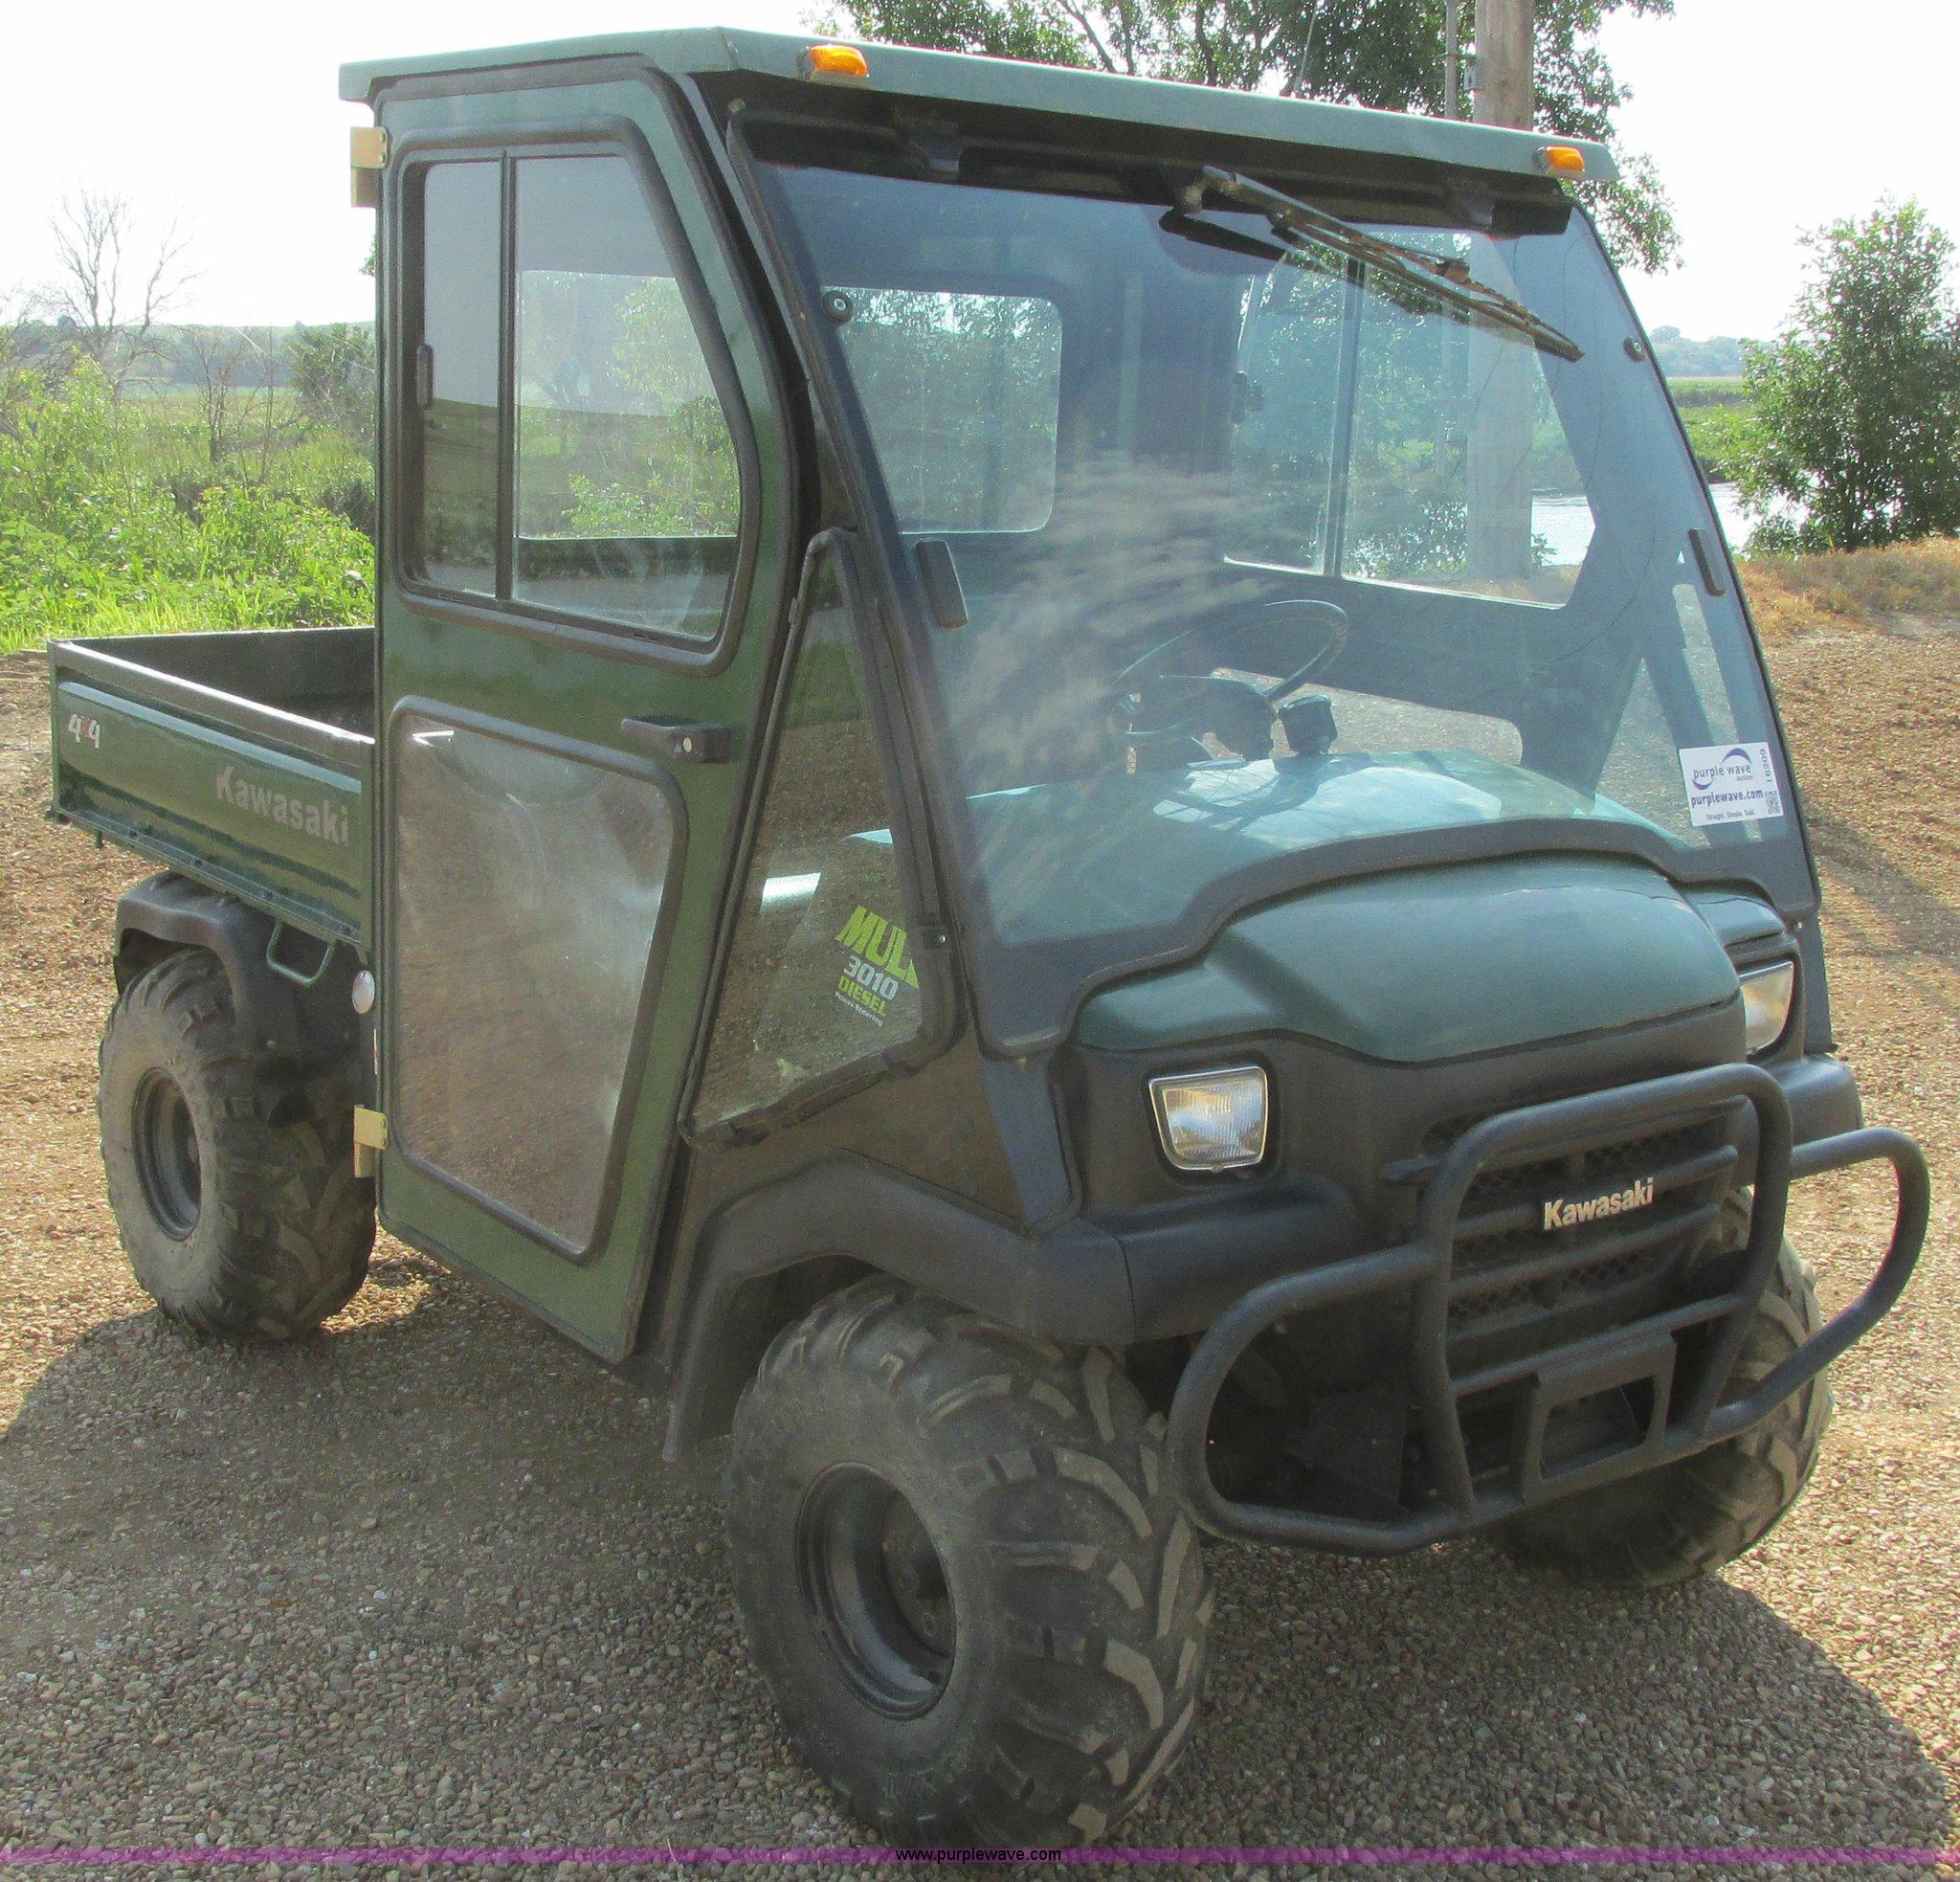 2008 Kawasaki Mule 3010 utility vehicle | Item I6209 | SOLD!